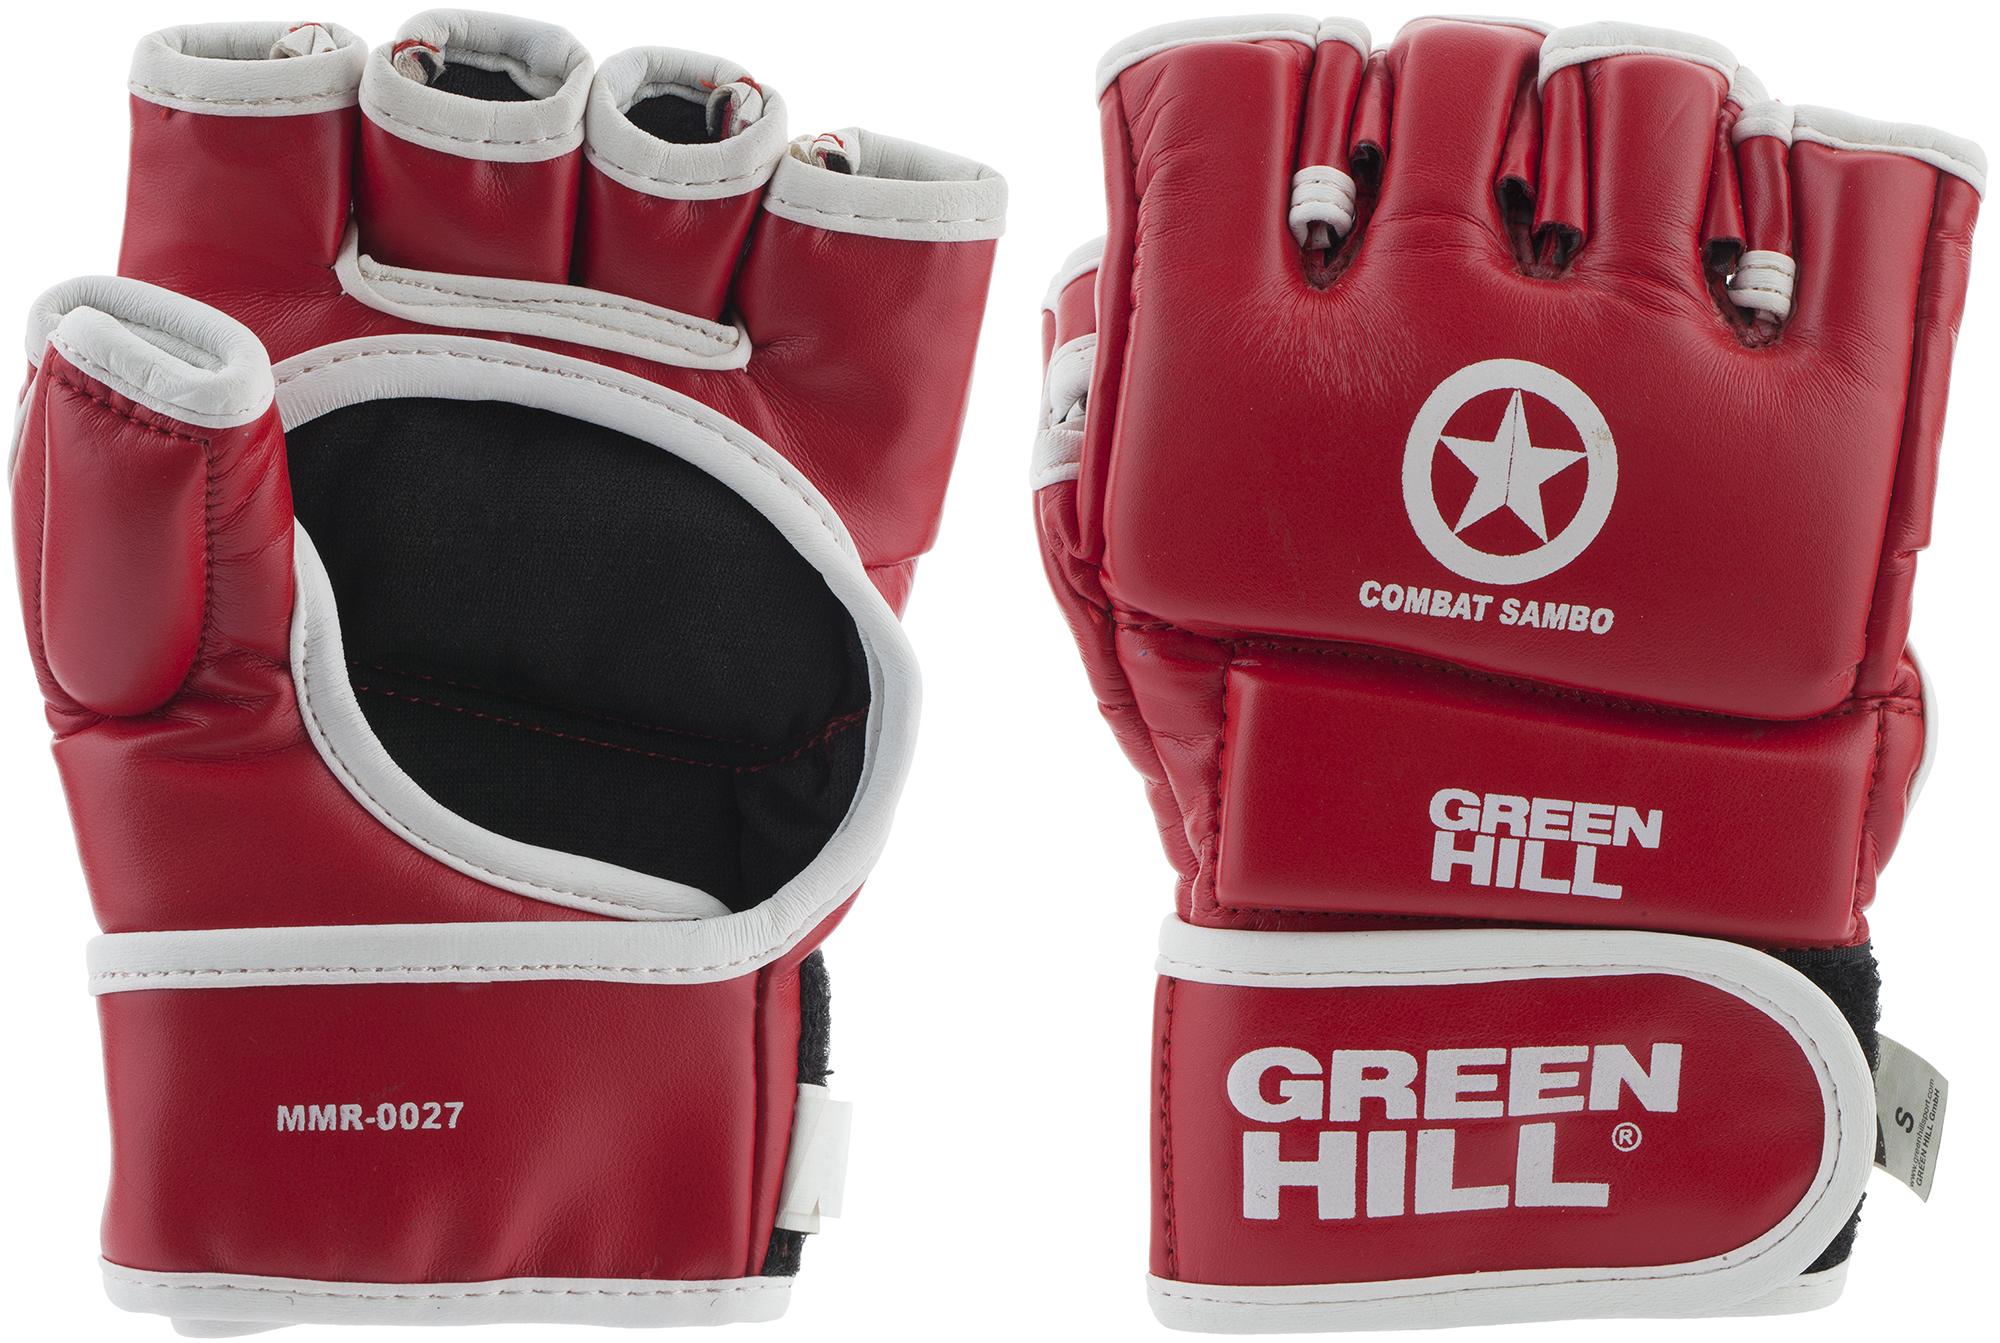 Green Hill Перчатки Green Hill Combat Sambo, размер 14 oz цена